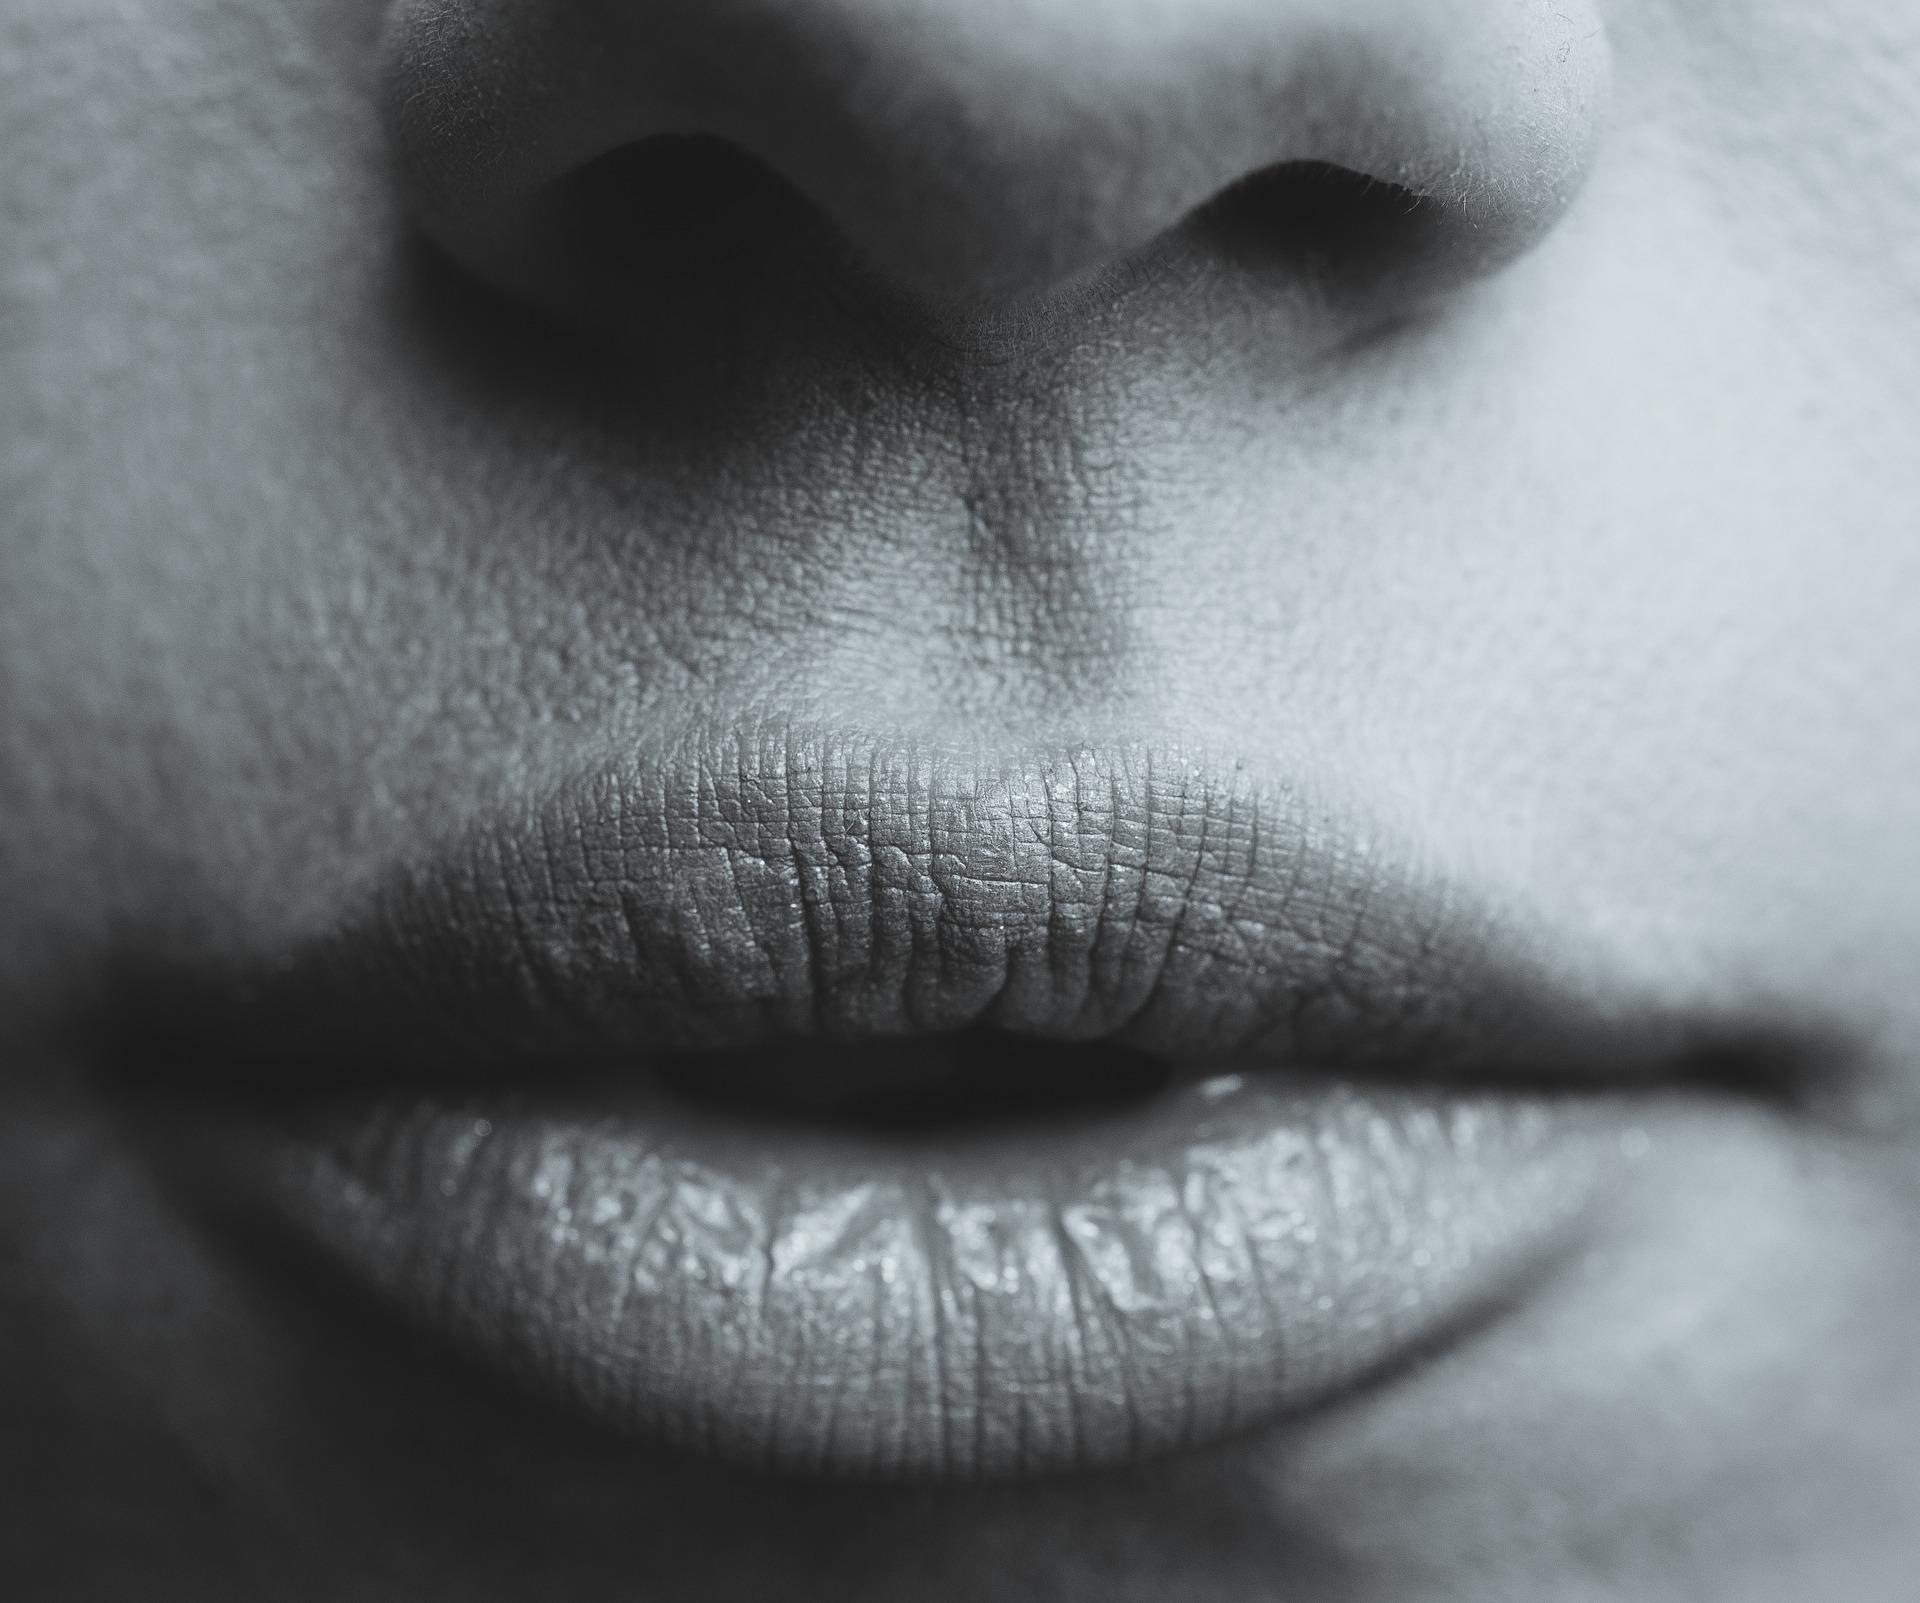 Azjatyckie obrazy seksu